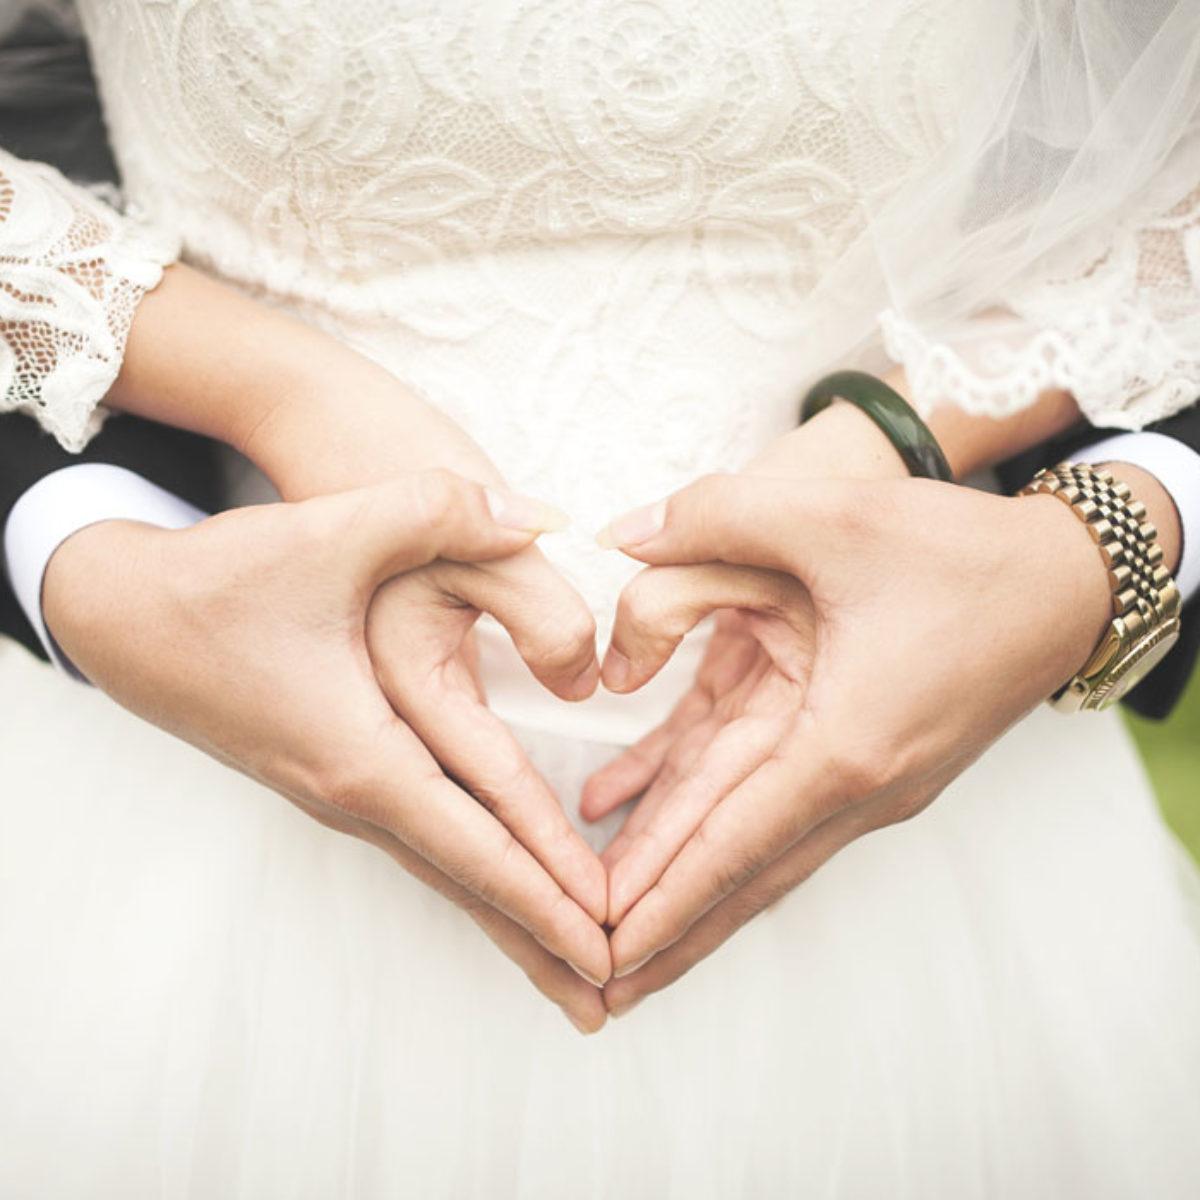 Frasi Per Matrimonio Divertenti.Le 100 Frasi Piu Divertenti Sul Matrimonio